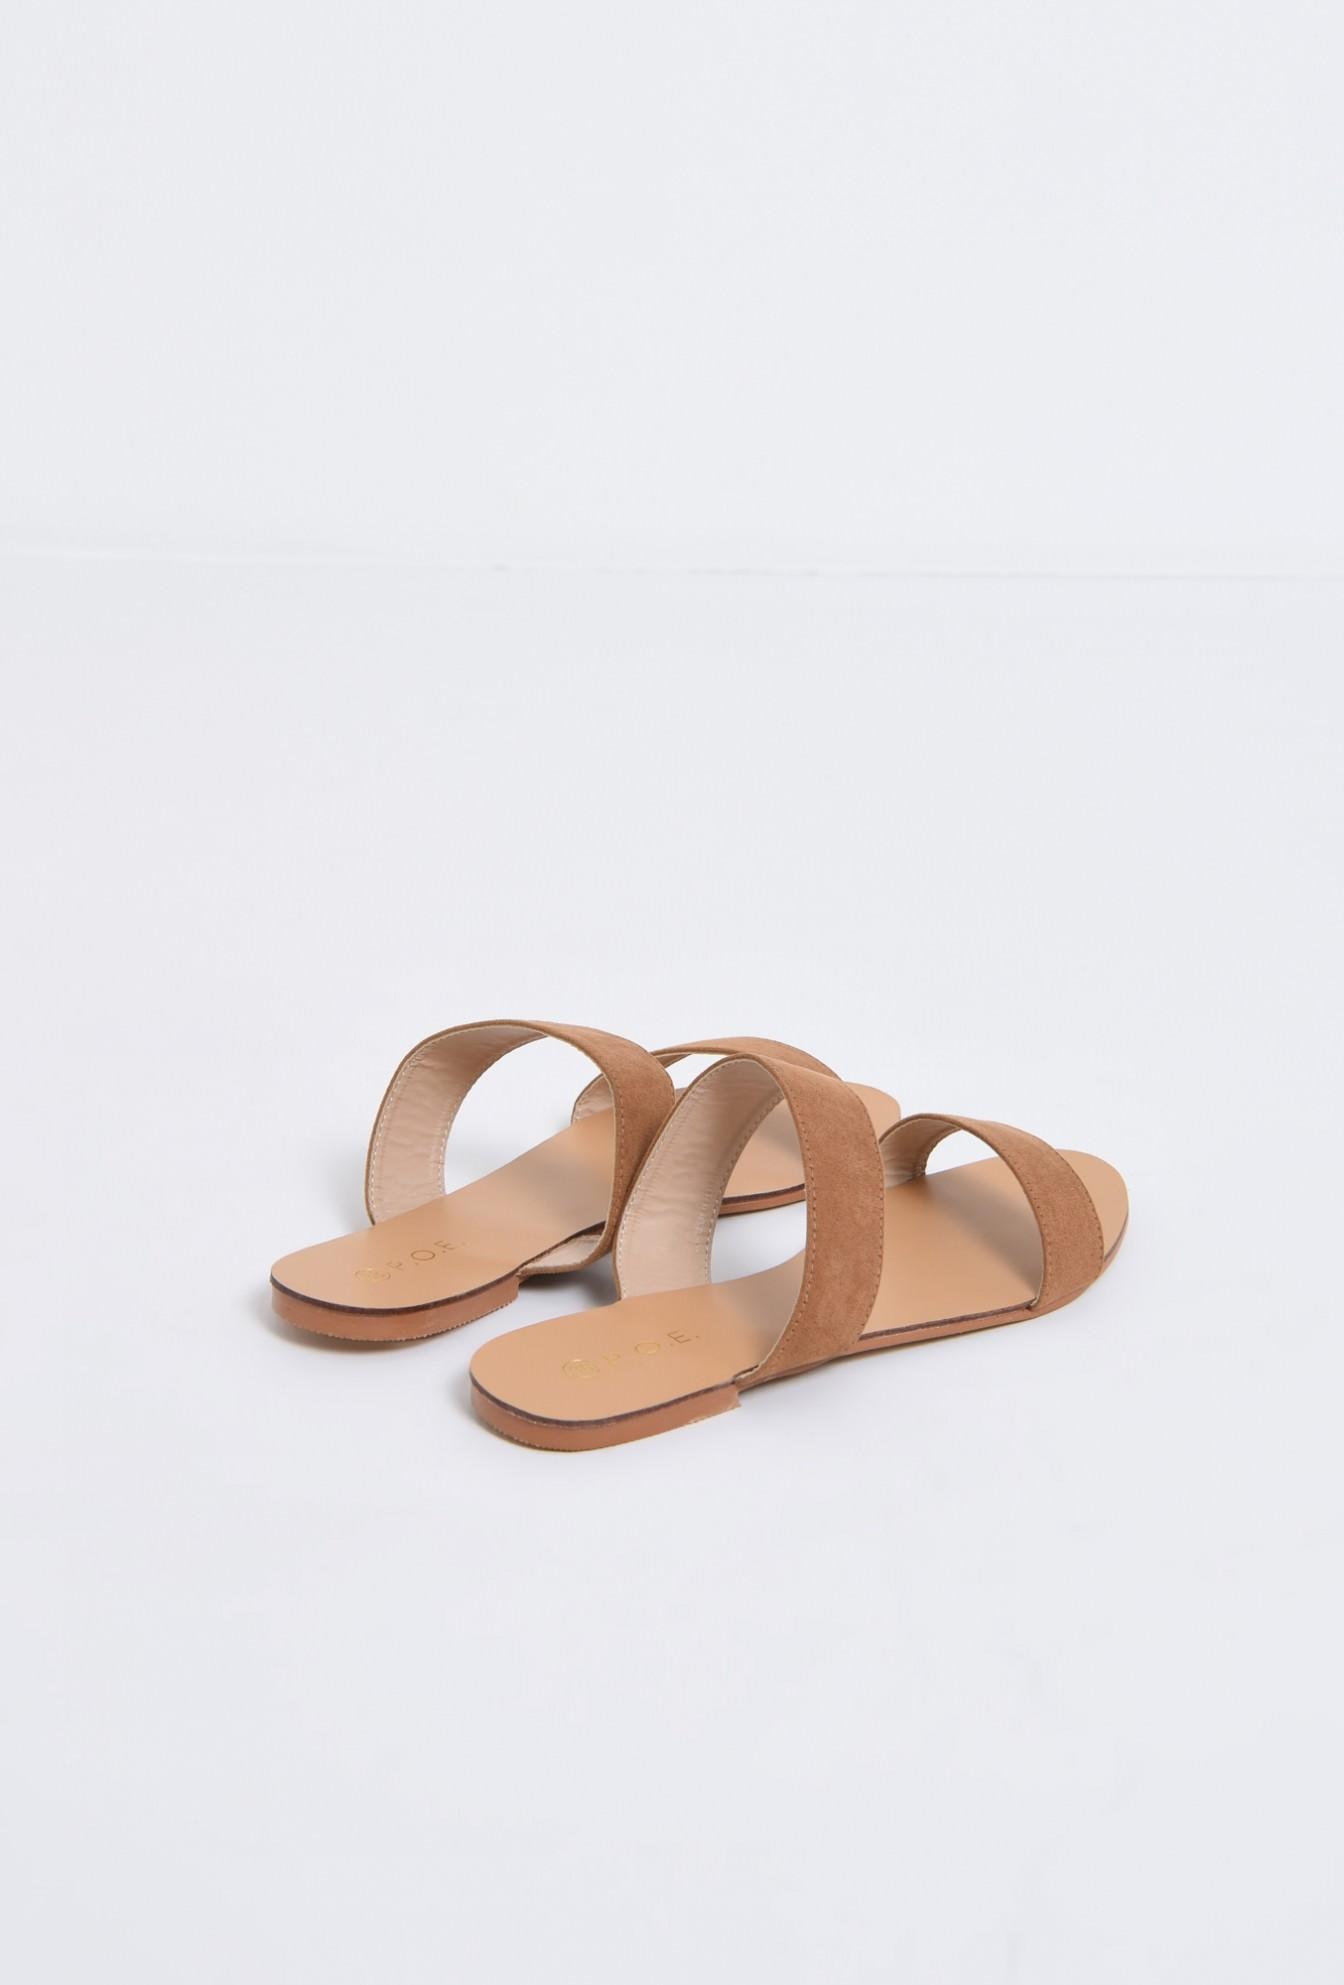 2 - papuci cu talpa joasa, velur, camel, barete late